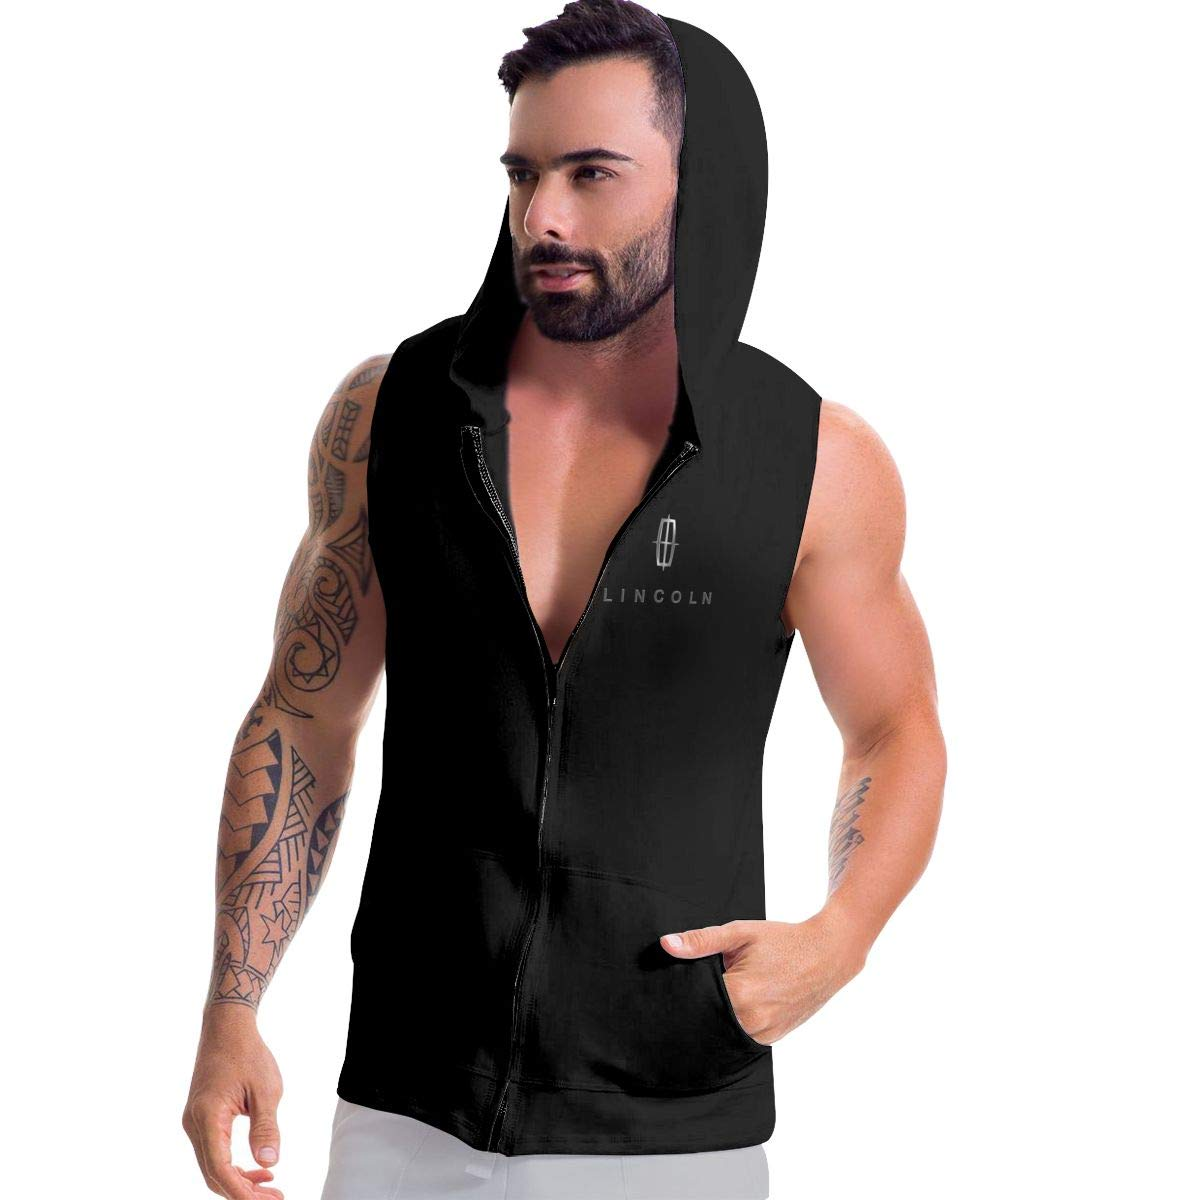 SHENGN Man Custom Classic Hooded Sack Lincoln Logo Zipper Sweatshirts